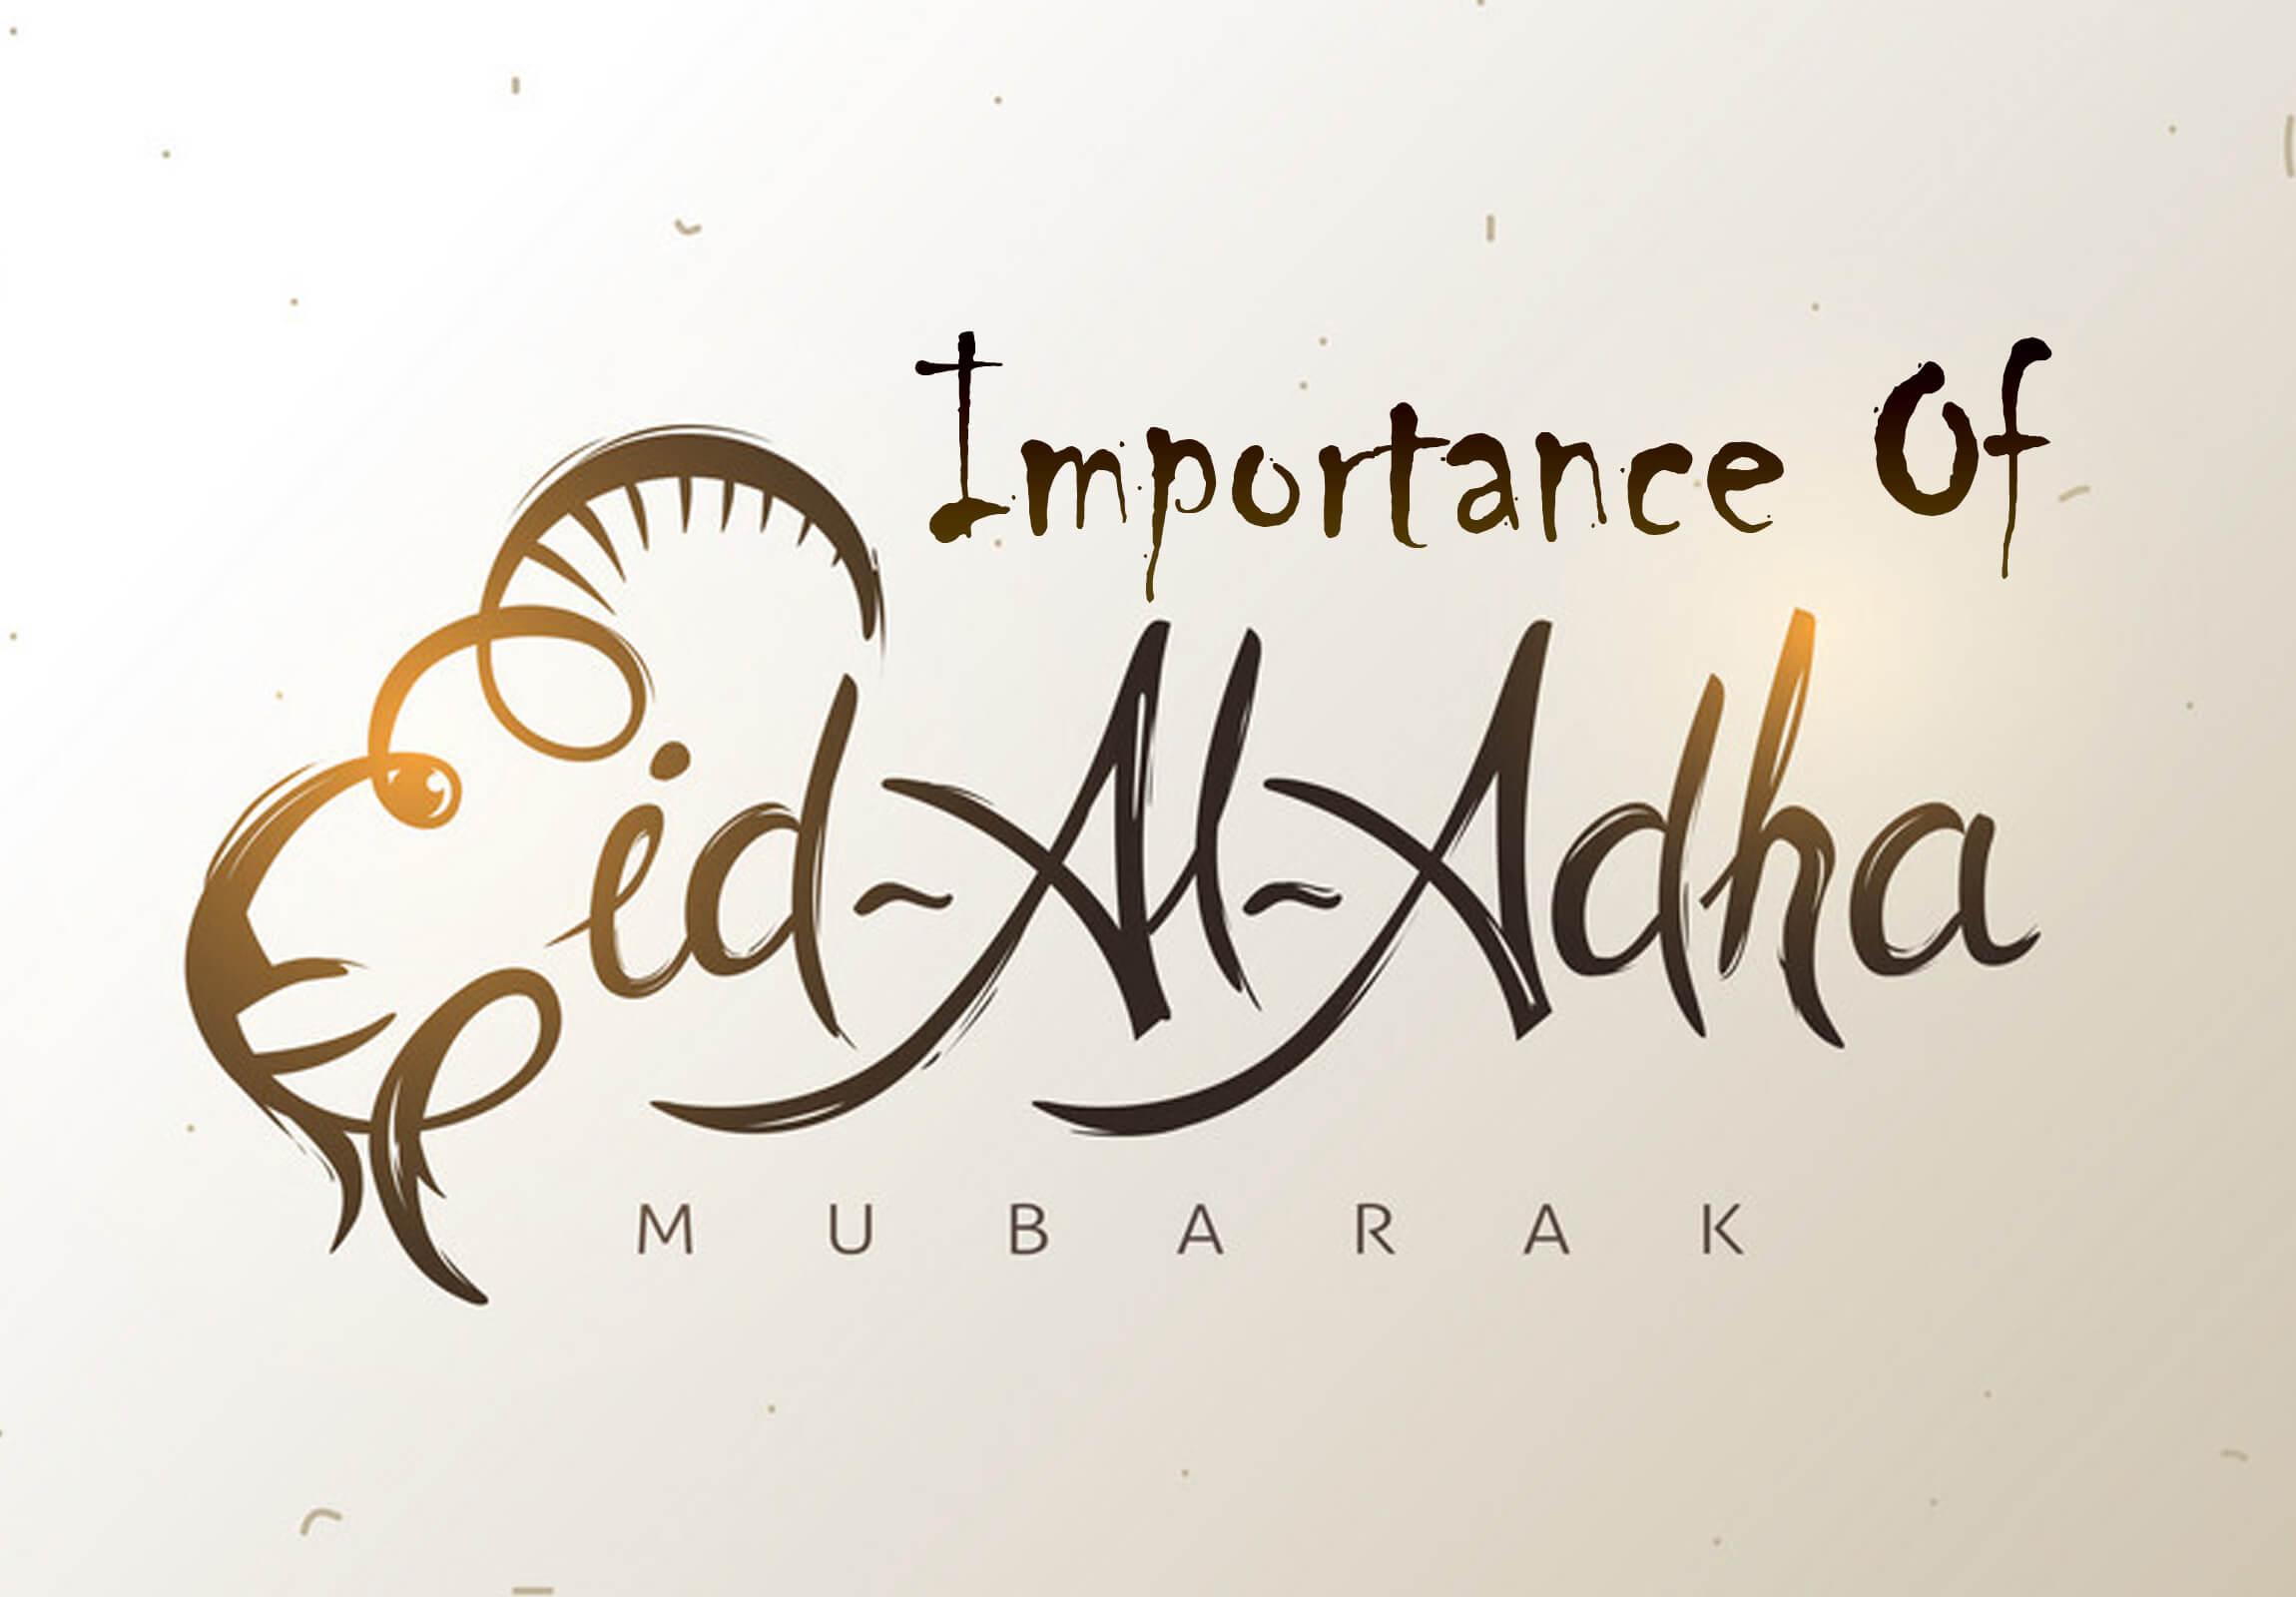 beautiful vector illustration image of eid al adha importance text